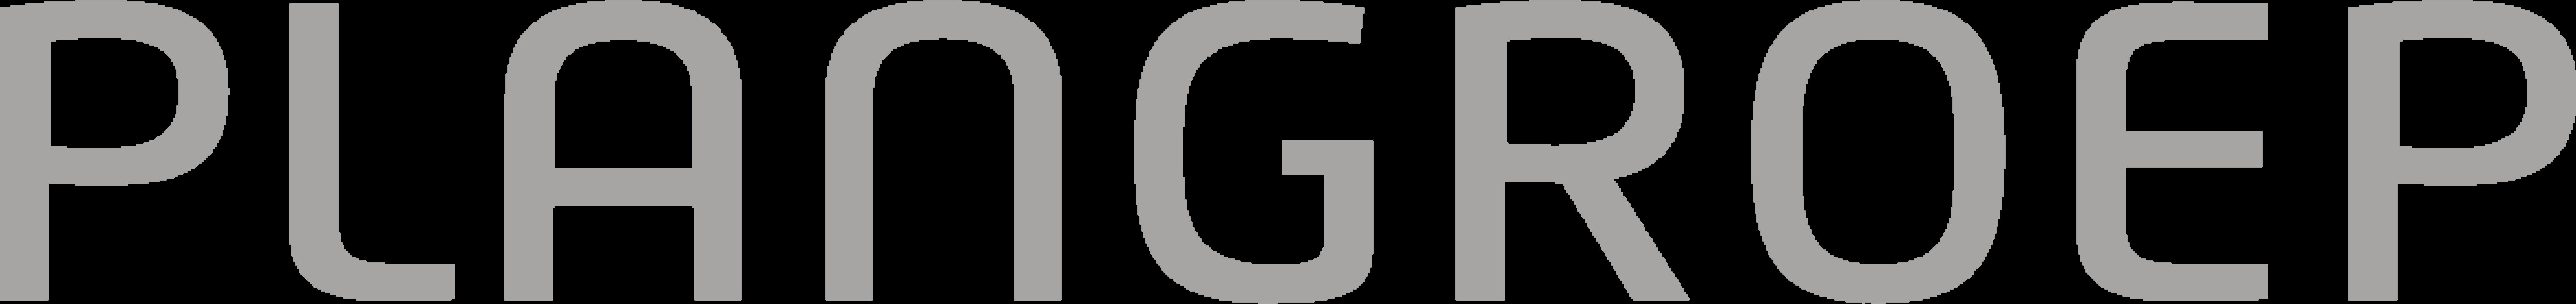 grey-logo-plangroep.png